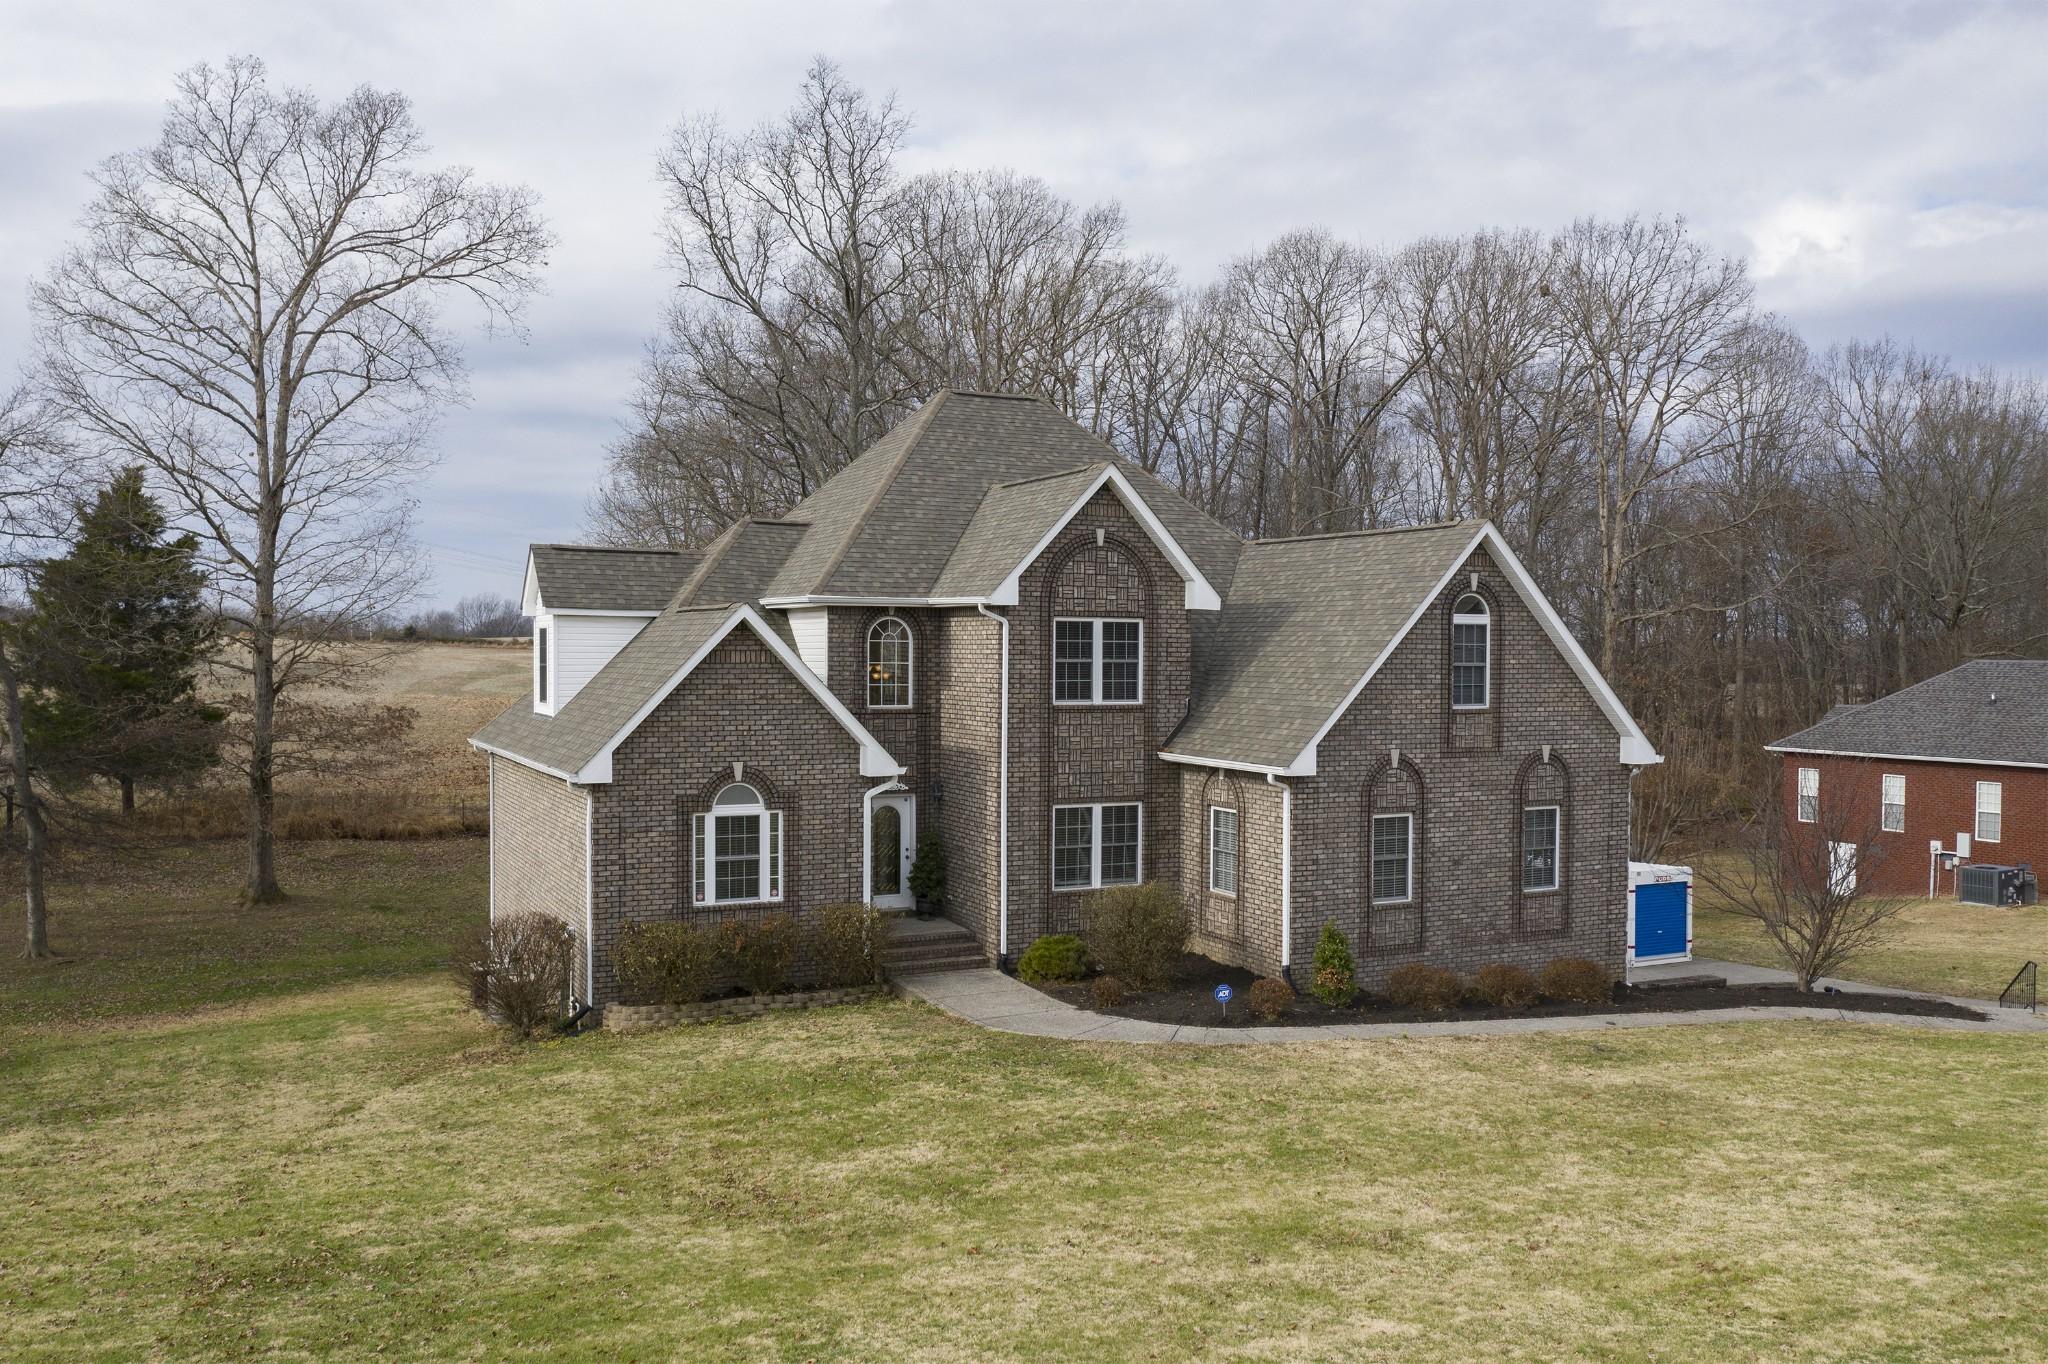 1016 Fairways Dr, Greenbrier, TN 37073 - Greenbrier, TN real estate listing